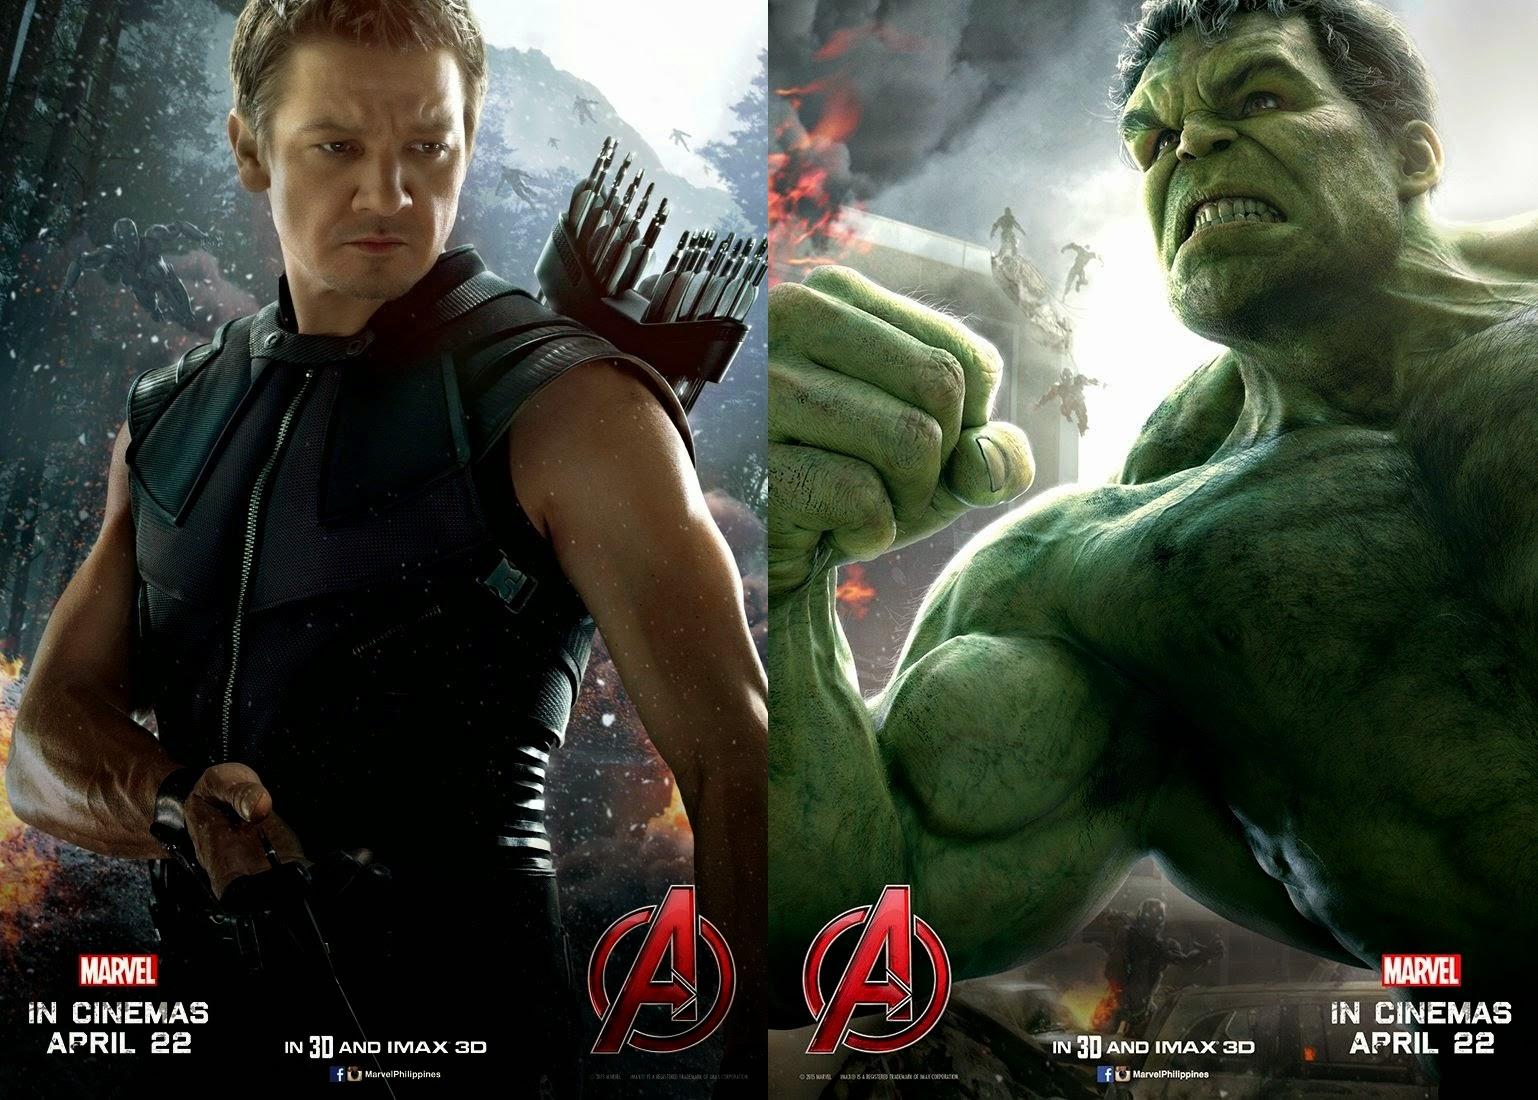 Hawkeye and Hulk Movie Poster